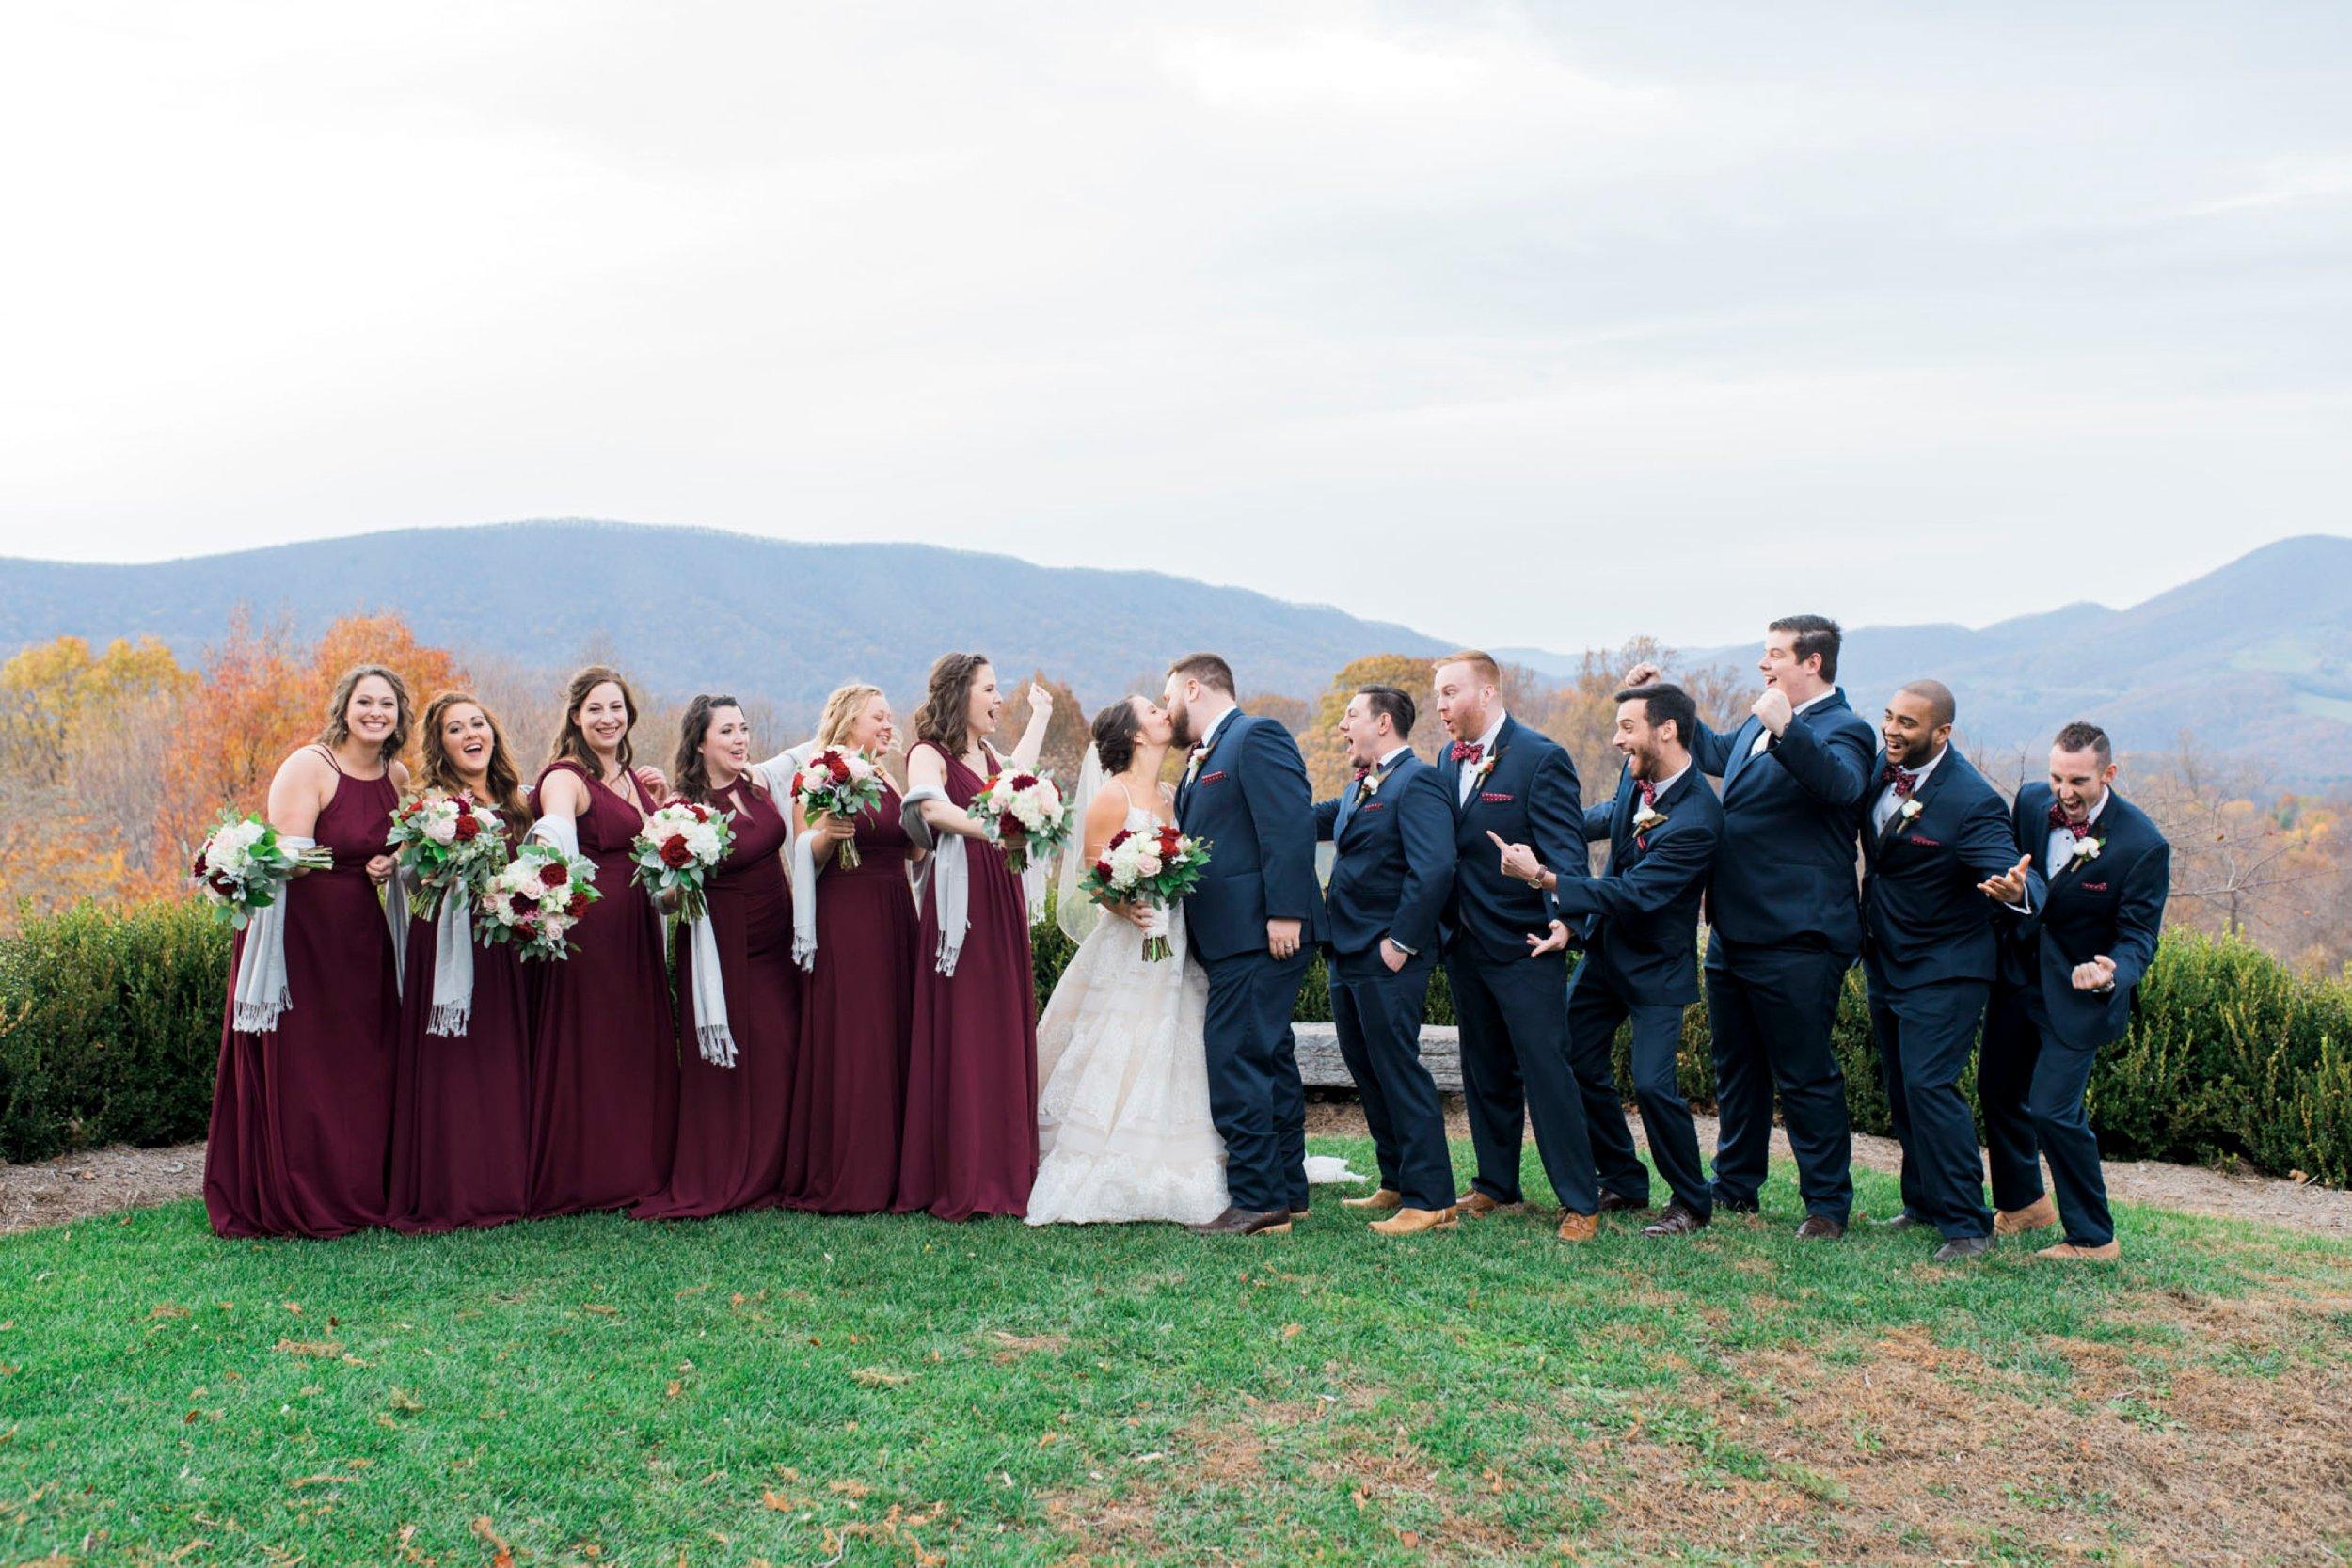 IrvineEstate_LexingtonVA_Wedding_FallWedding_VirginiaWeddingPhotographer 67.jpg